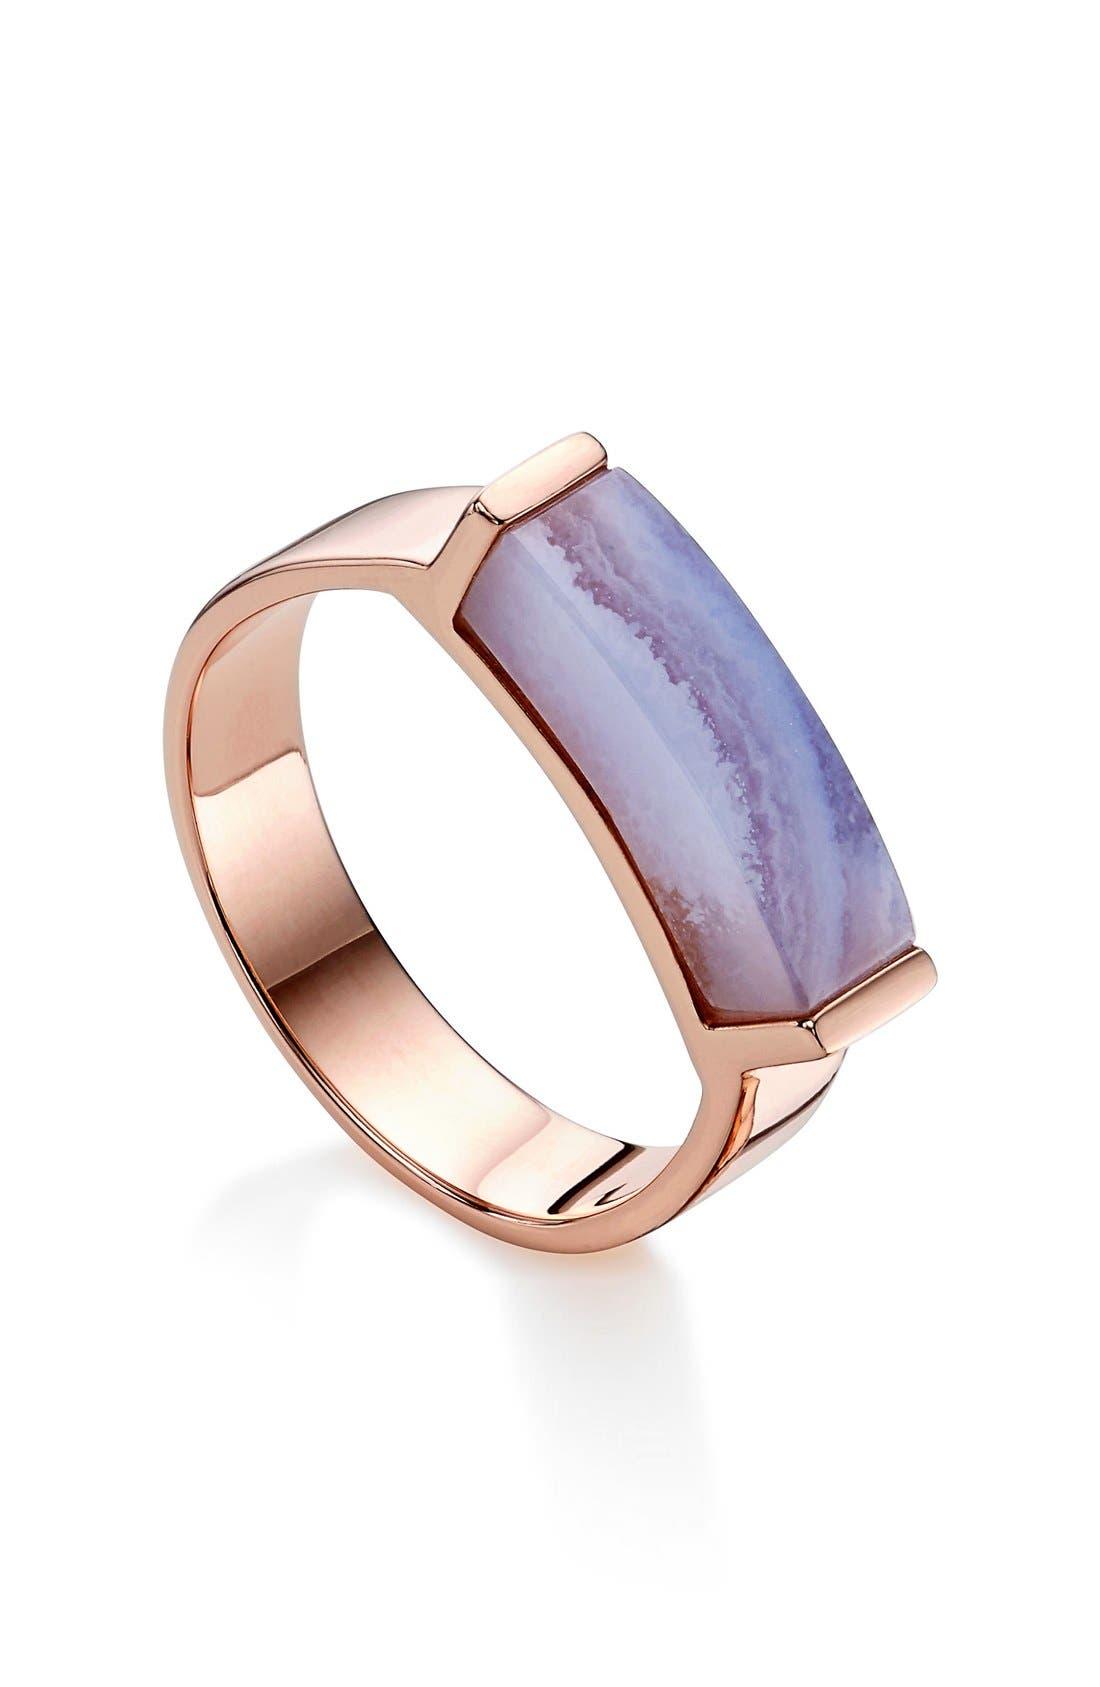 Main Image - Monica Vinader Linear Stone Ring